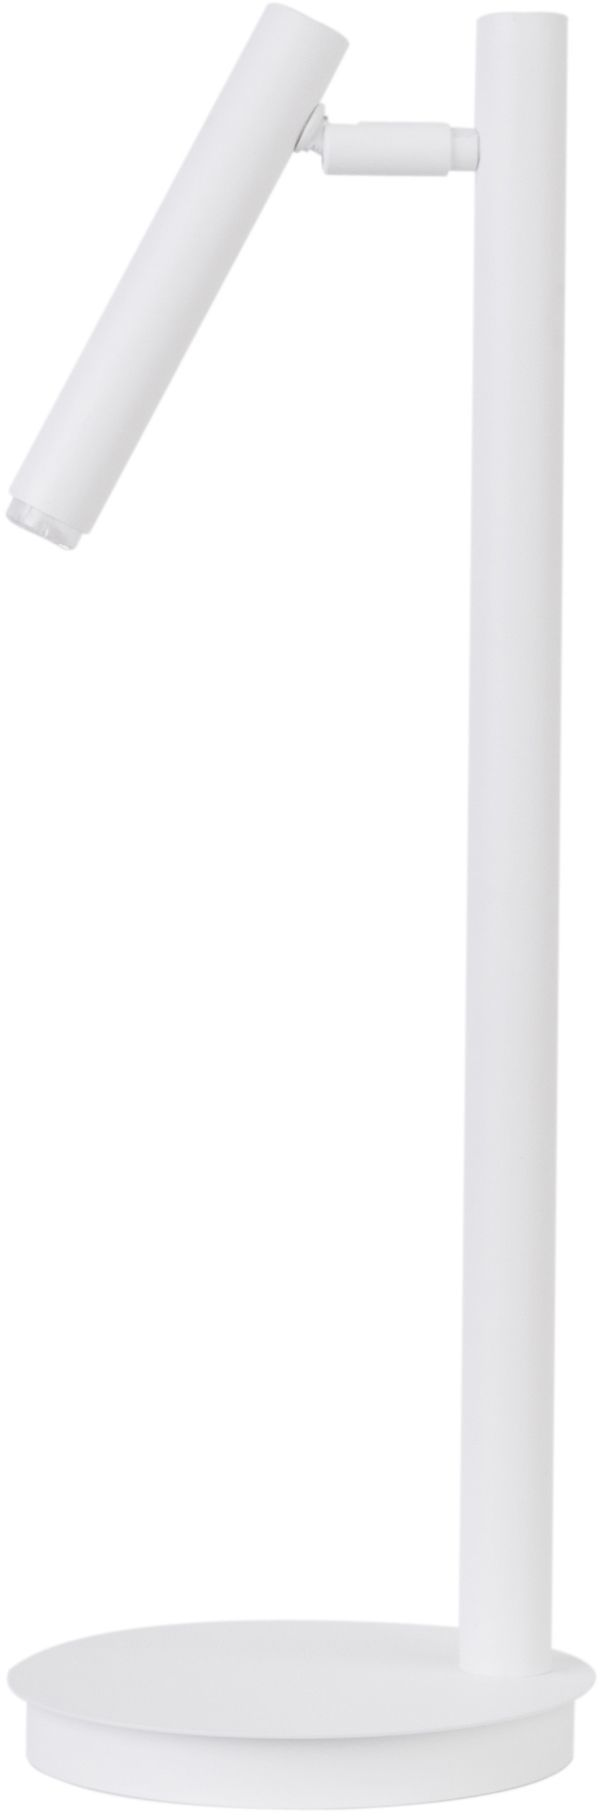 SIGMA LAMPA SOPEL BIAŁY 50196